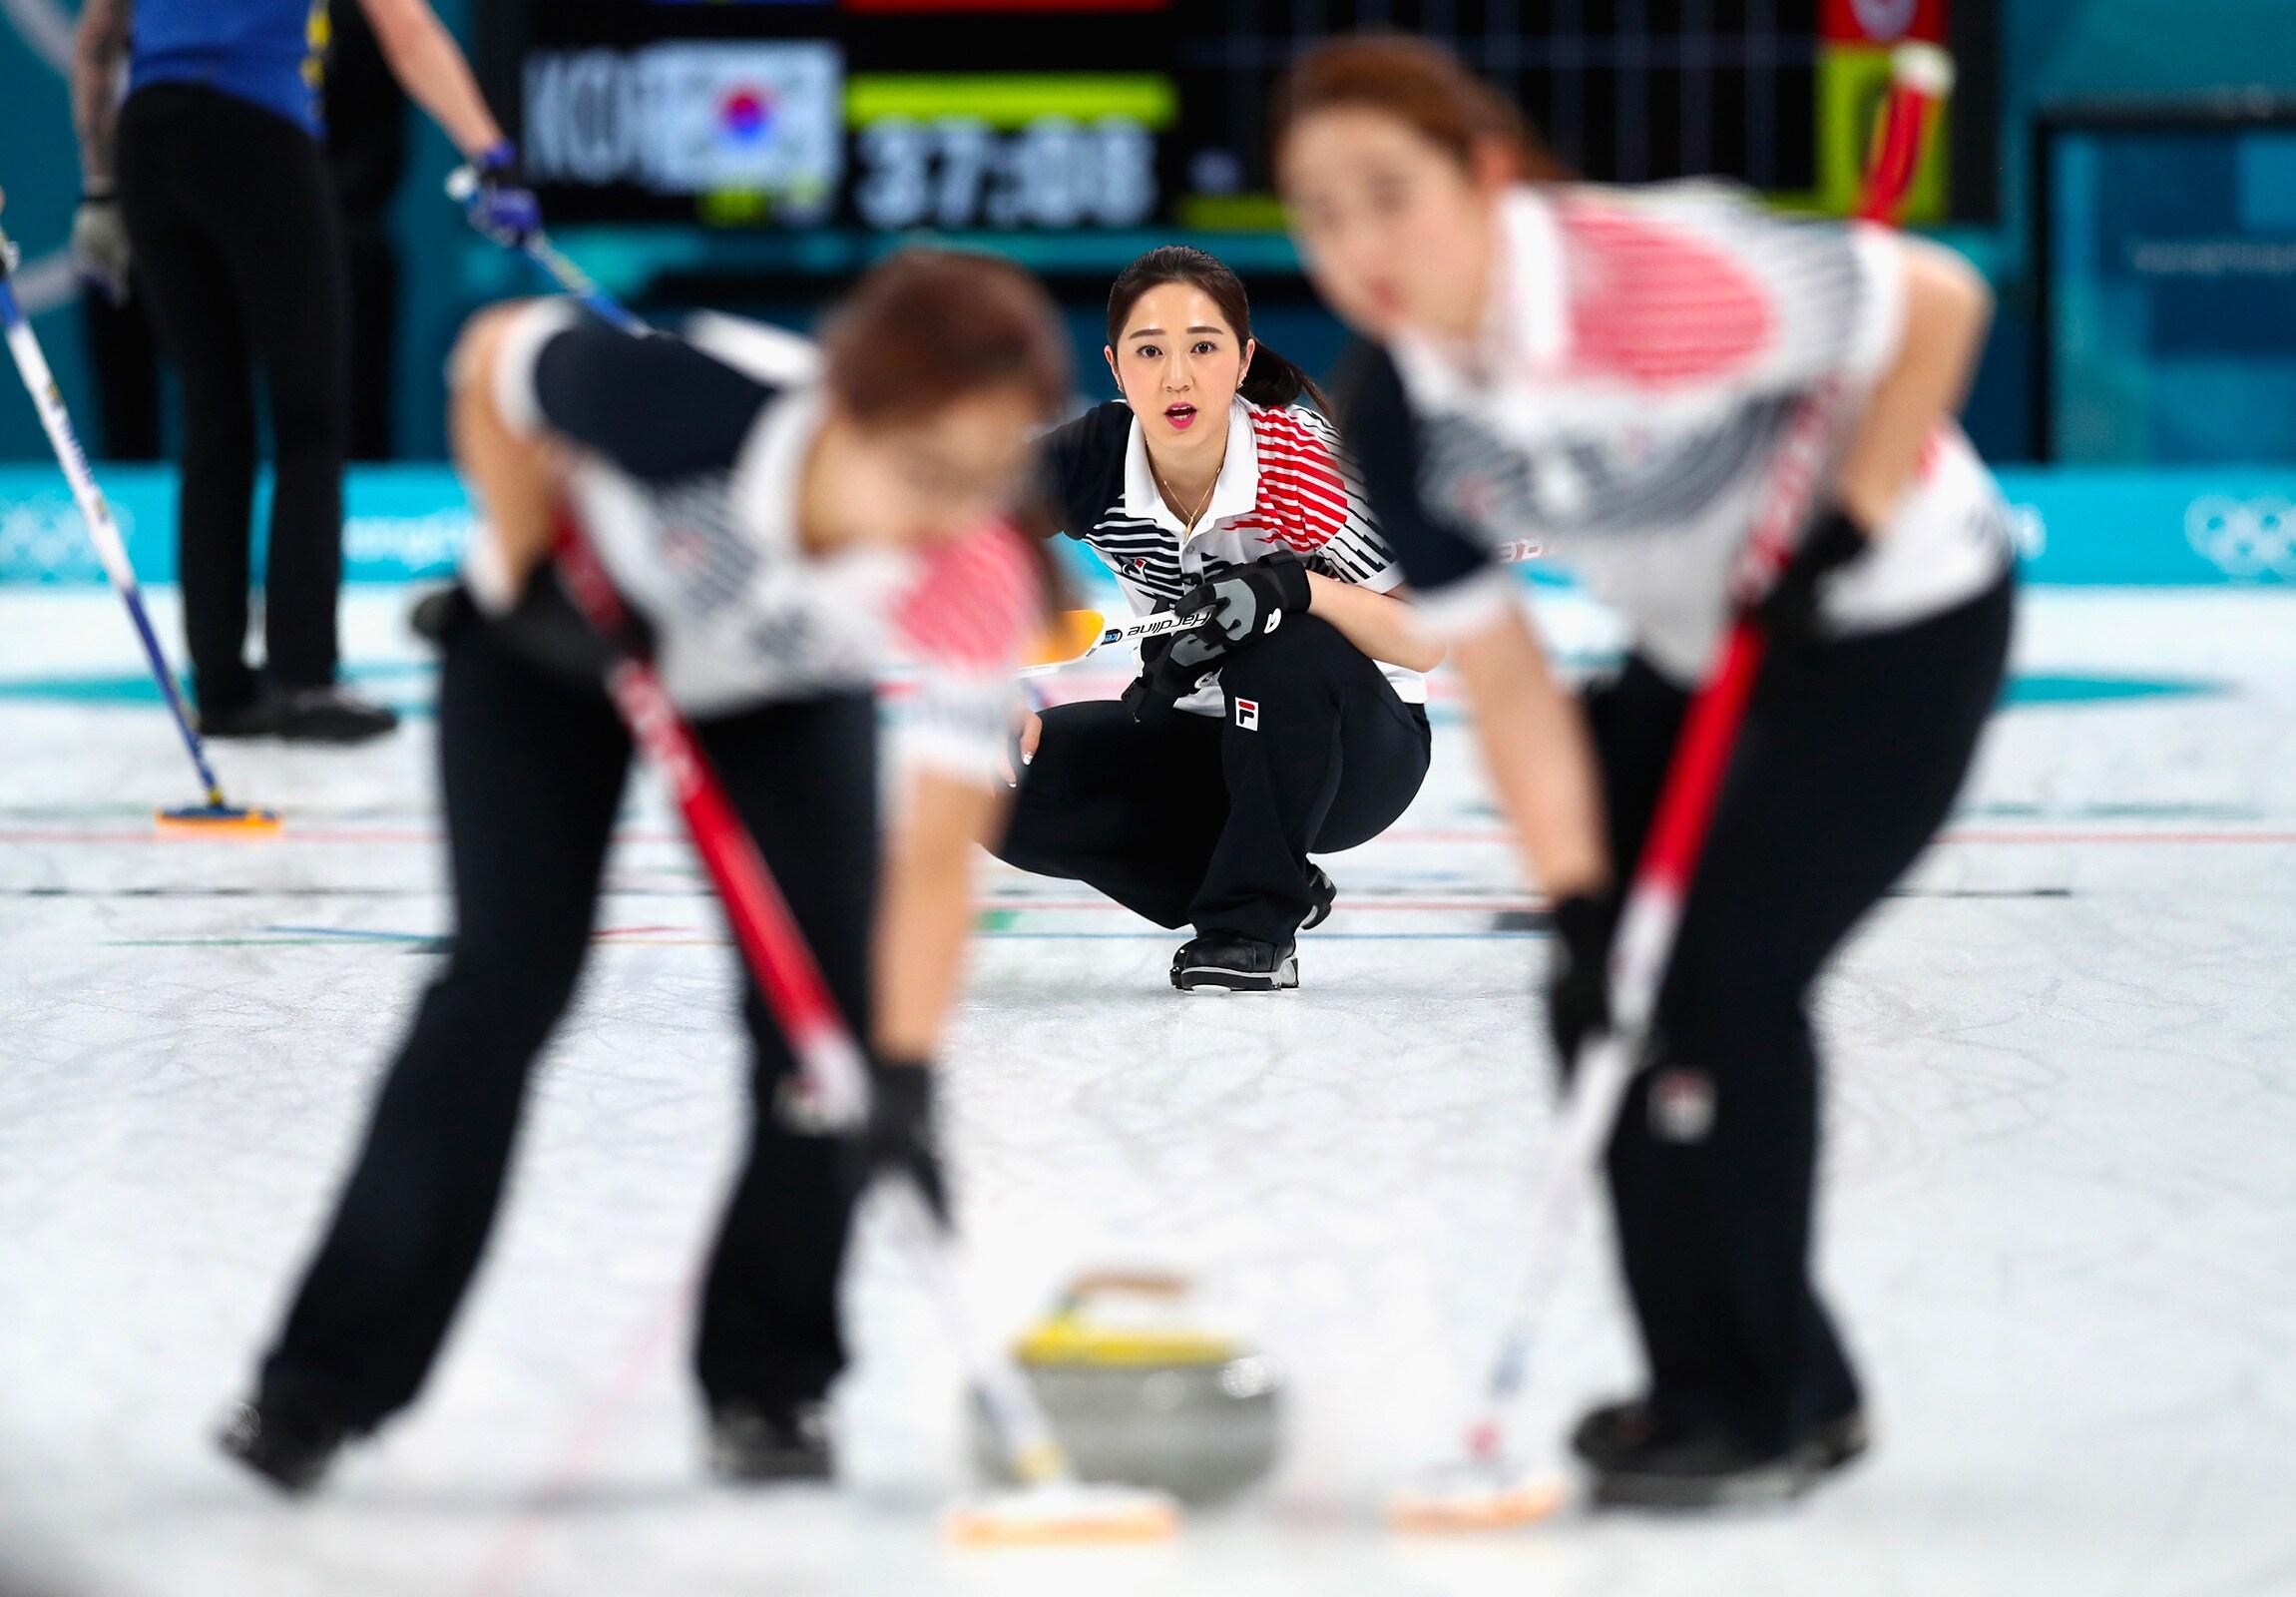 Curling - Femmes match médaille d'or